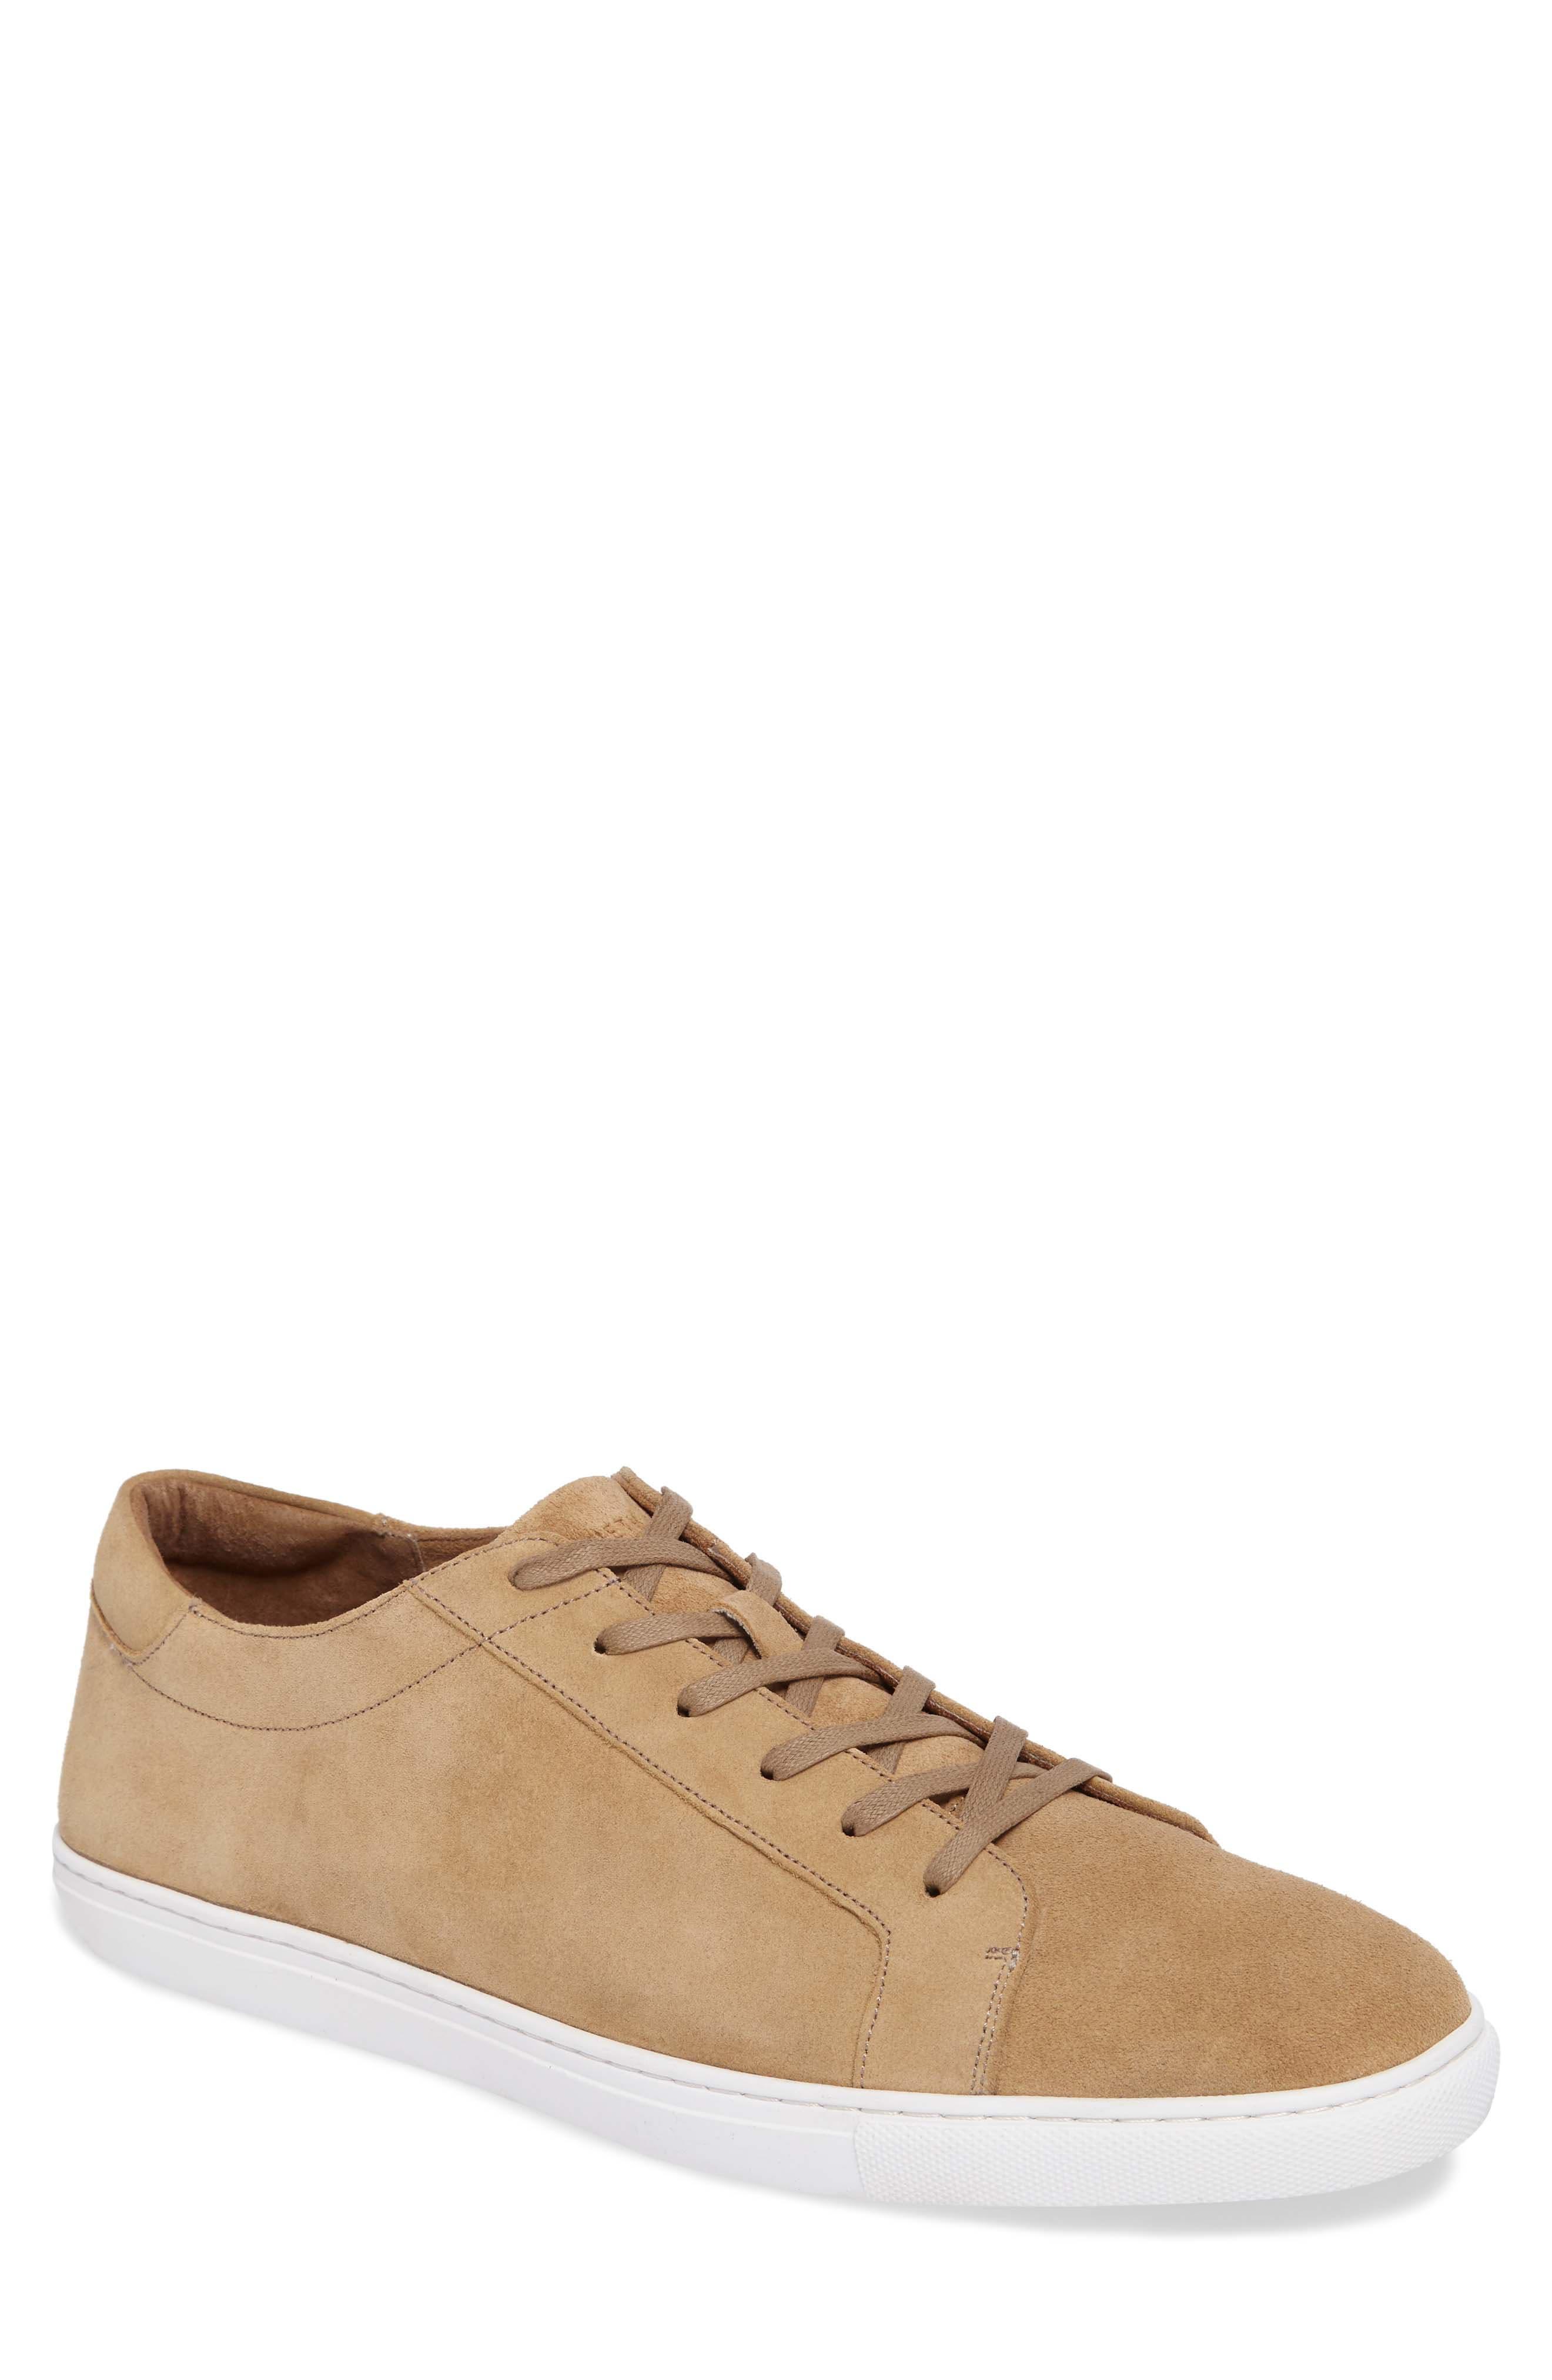 Kam Sneaker,                         Main,                         color, Camel Suede